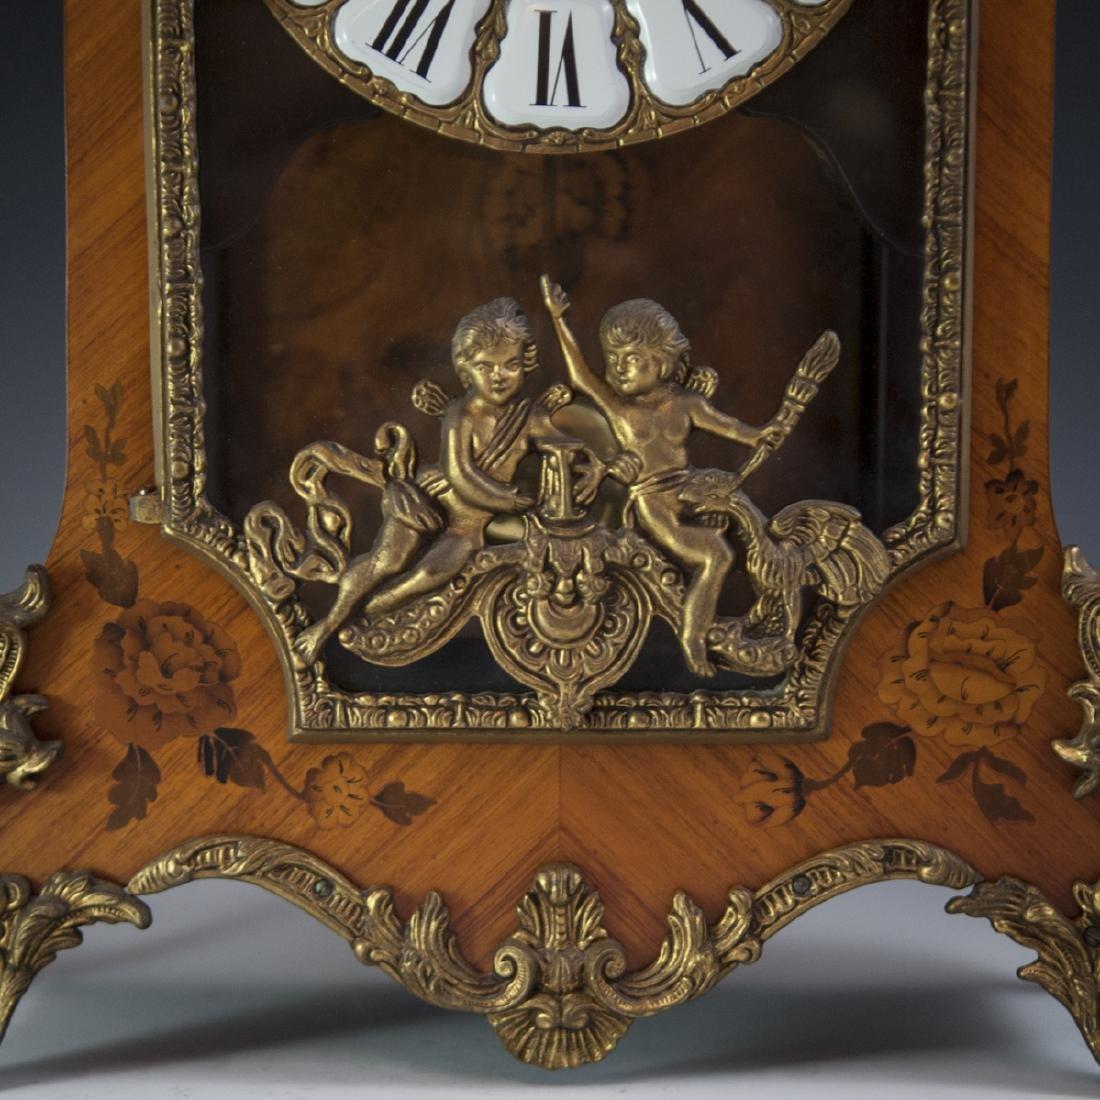 Franz Hermle and Sohn Marquetry & Bronze Mantel Clock - 9